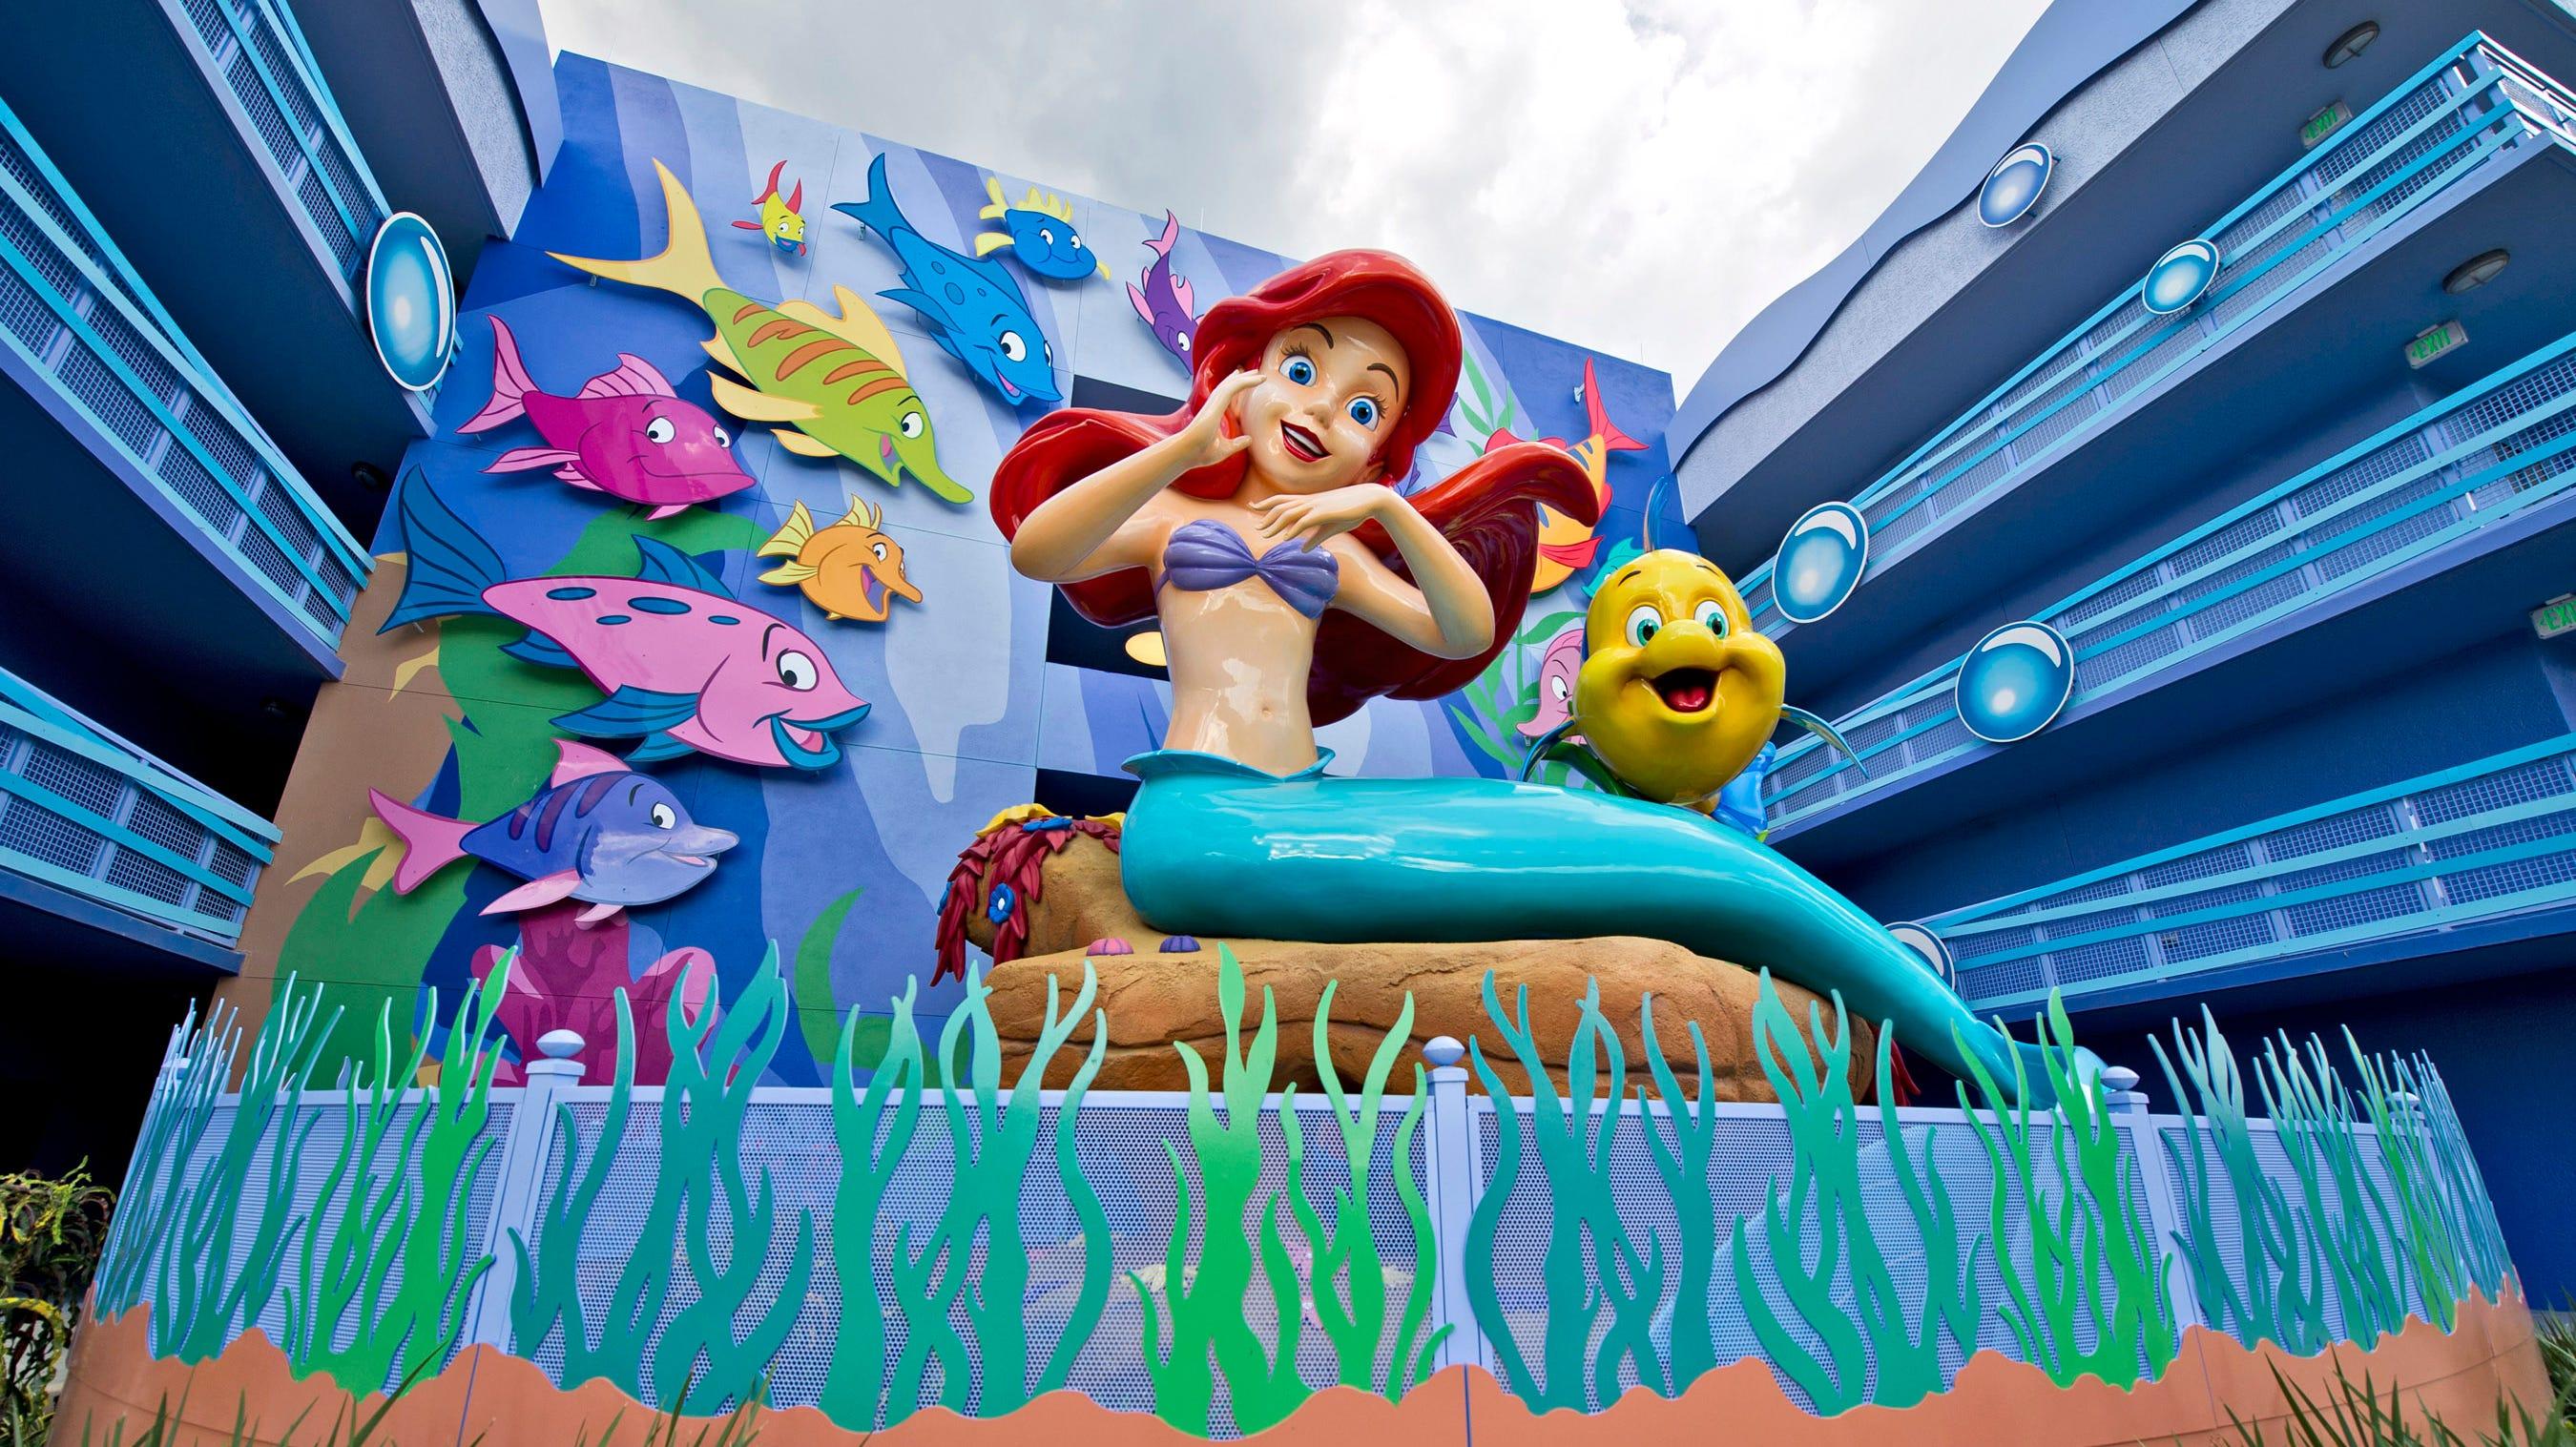 Walt Disney World Resort Properties - Up to 25% Off Summer Stays On Most Nights July 11-Sept 29, 2021